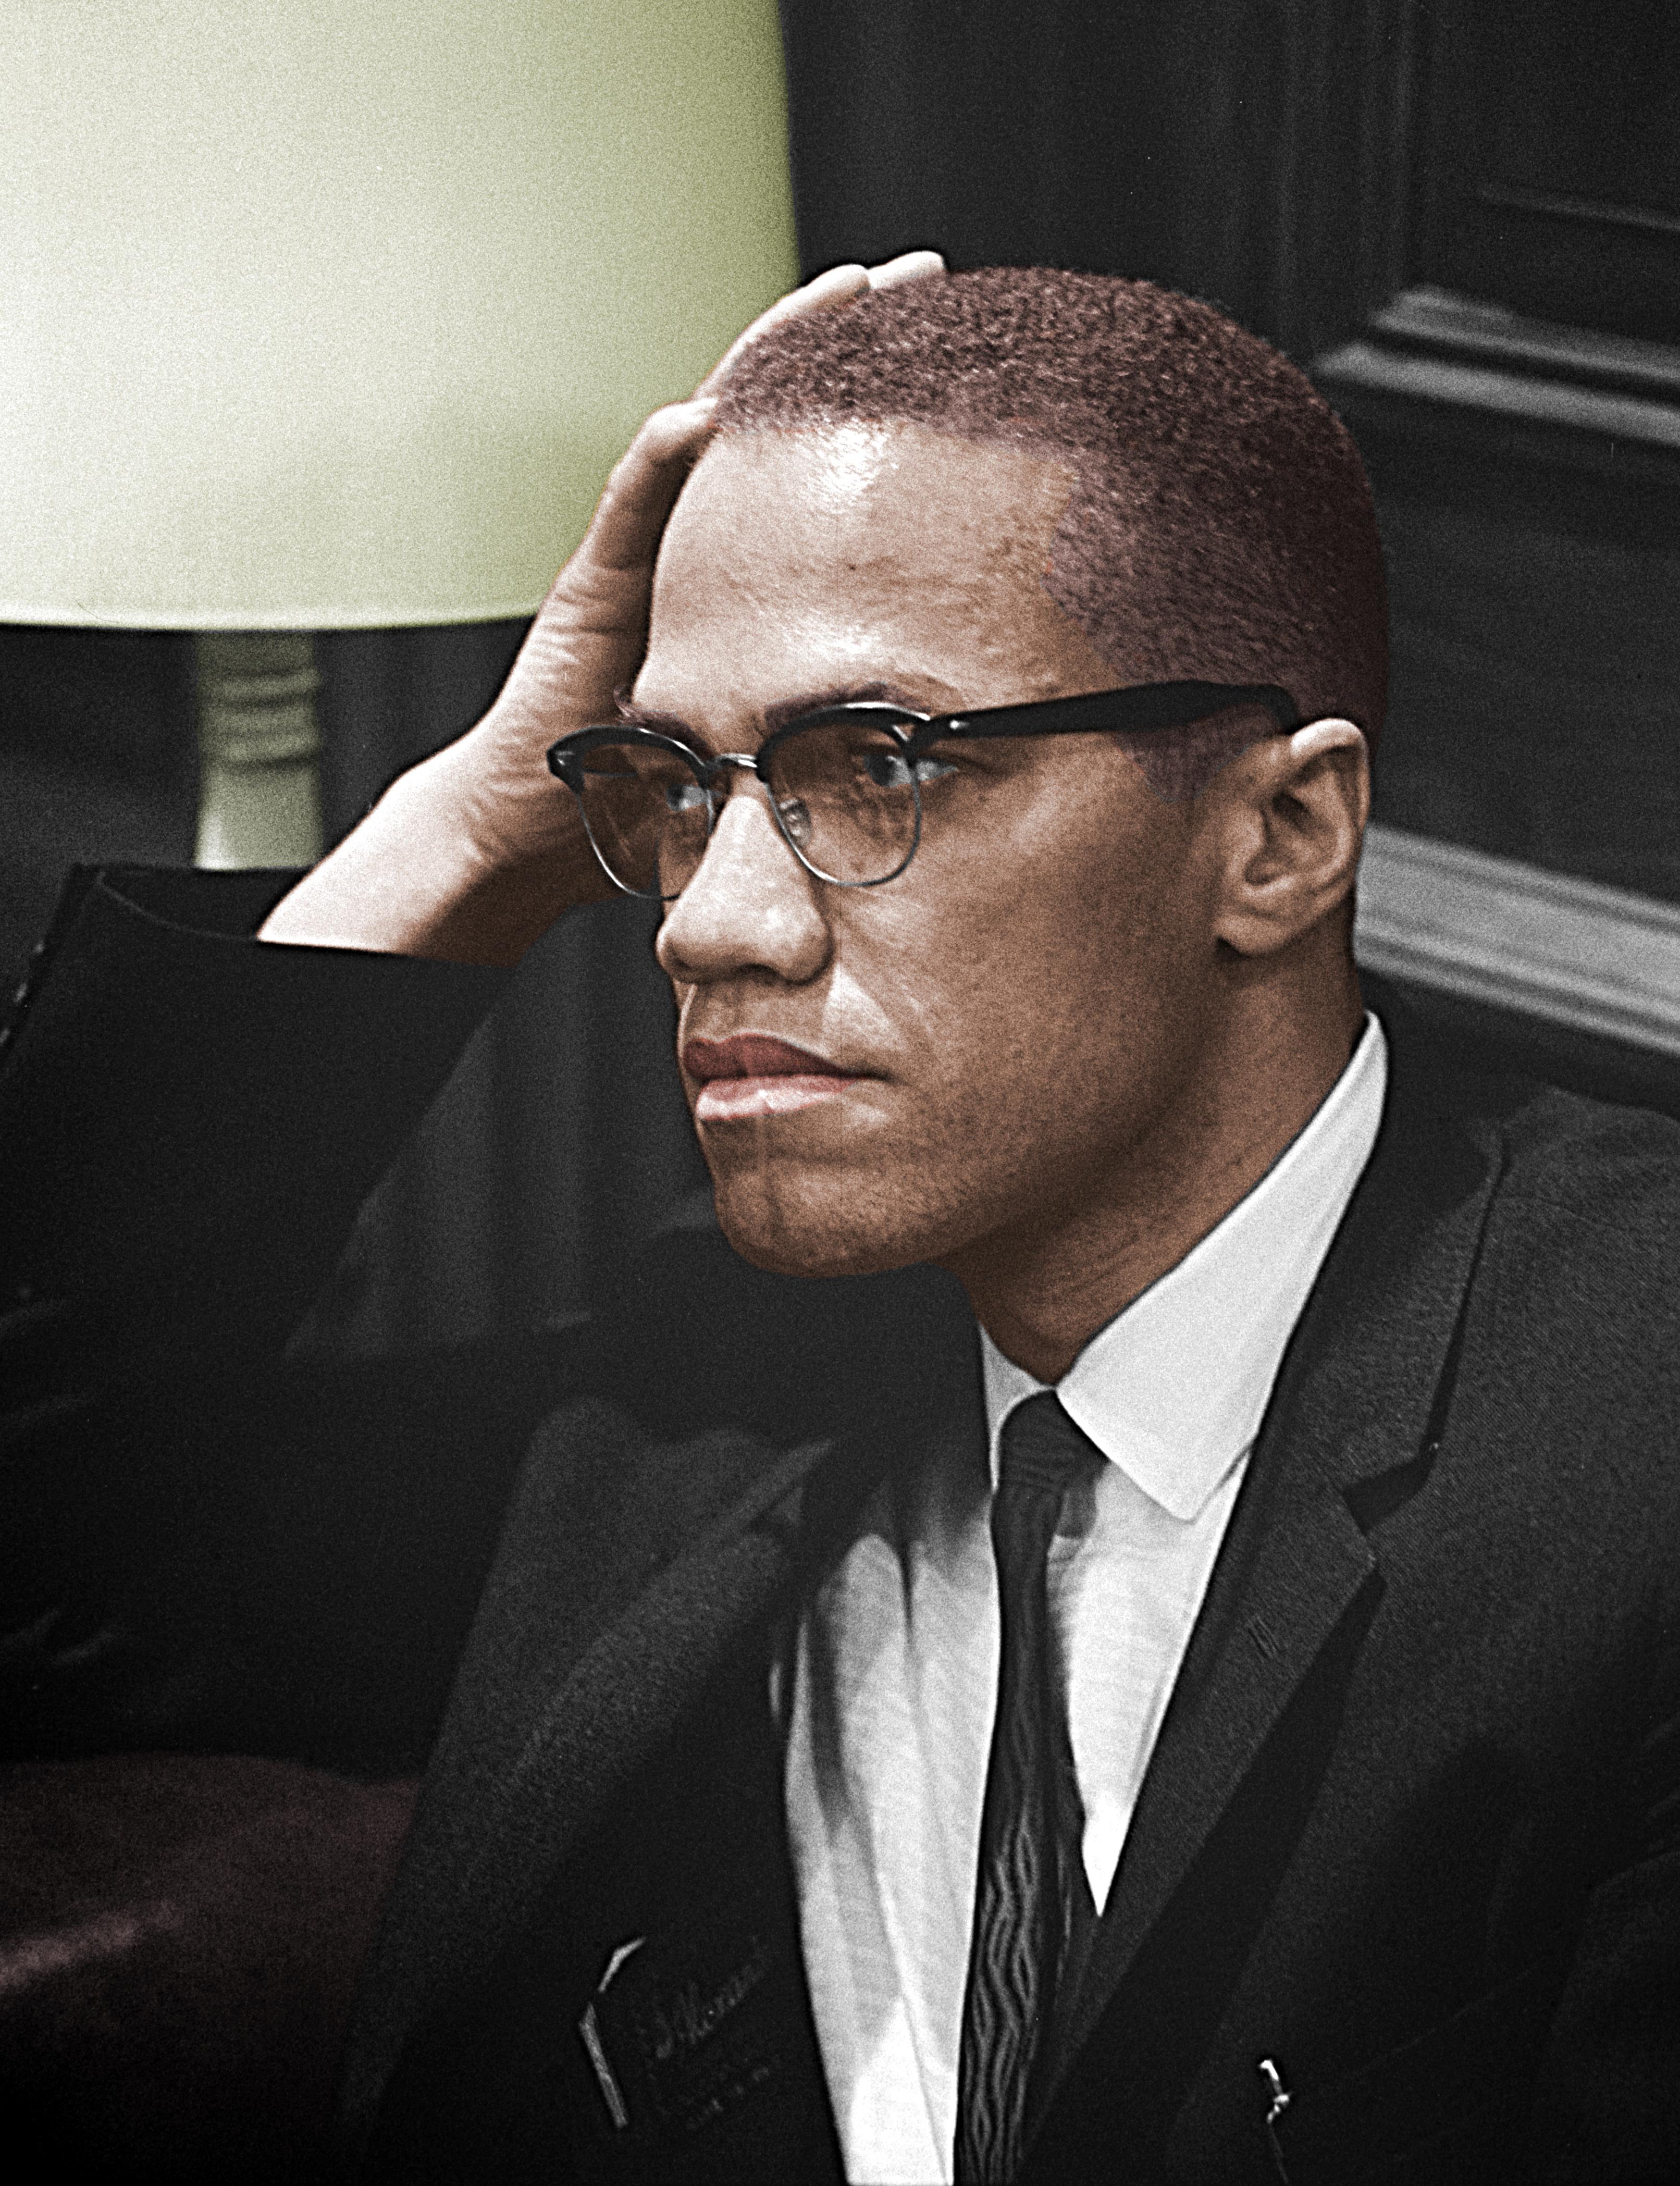 File:Malcolm-x colorized photo.jpg - Wikimedia Commons